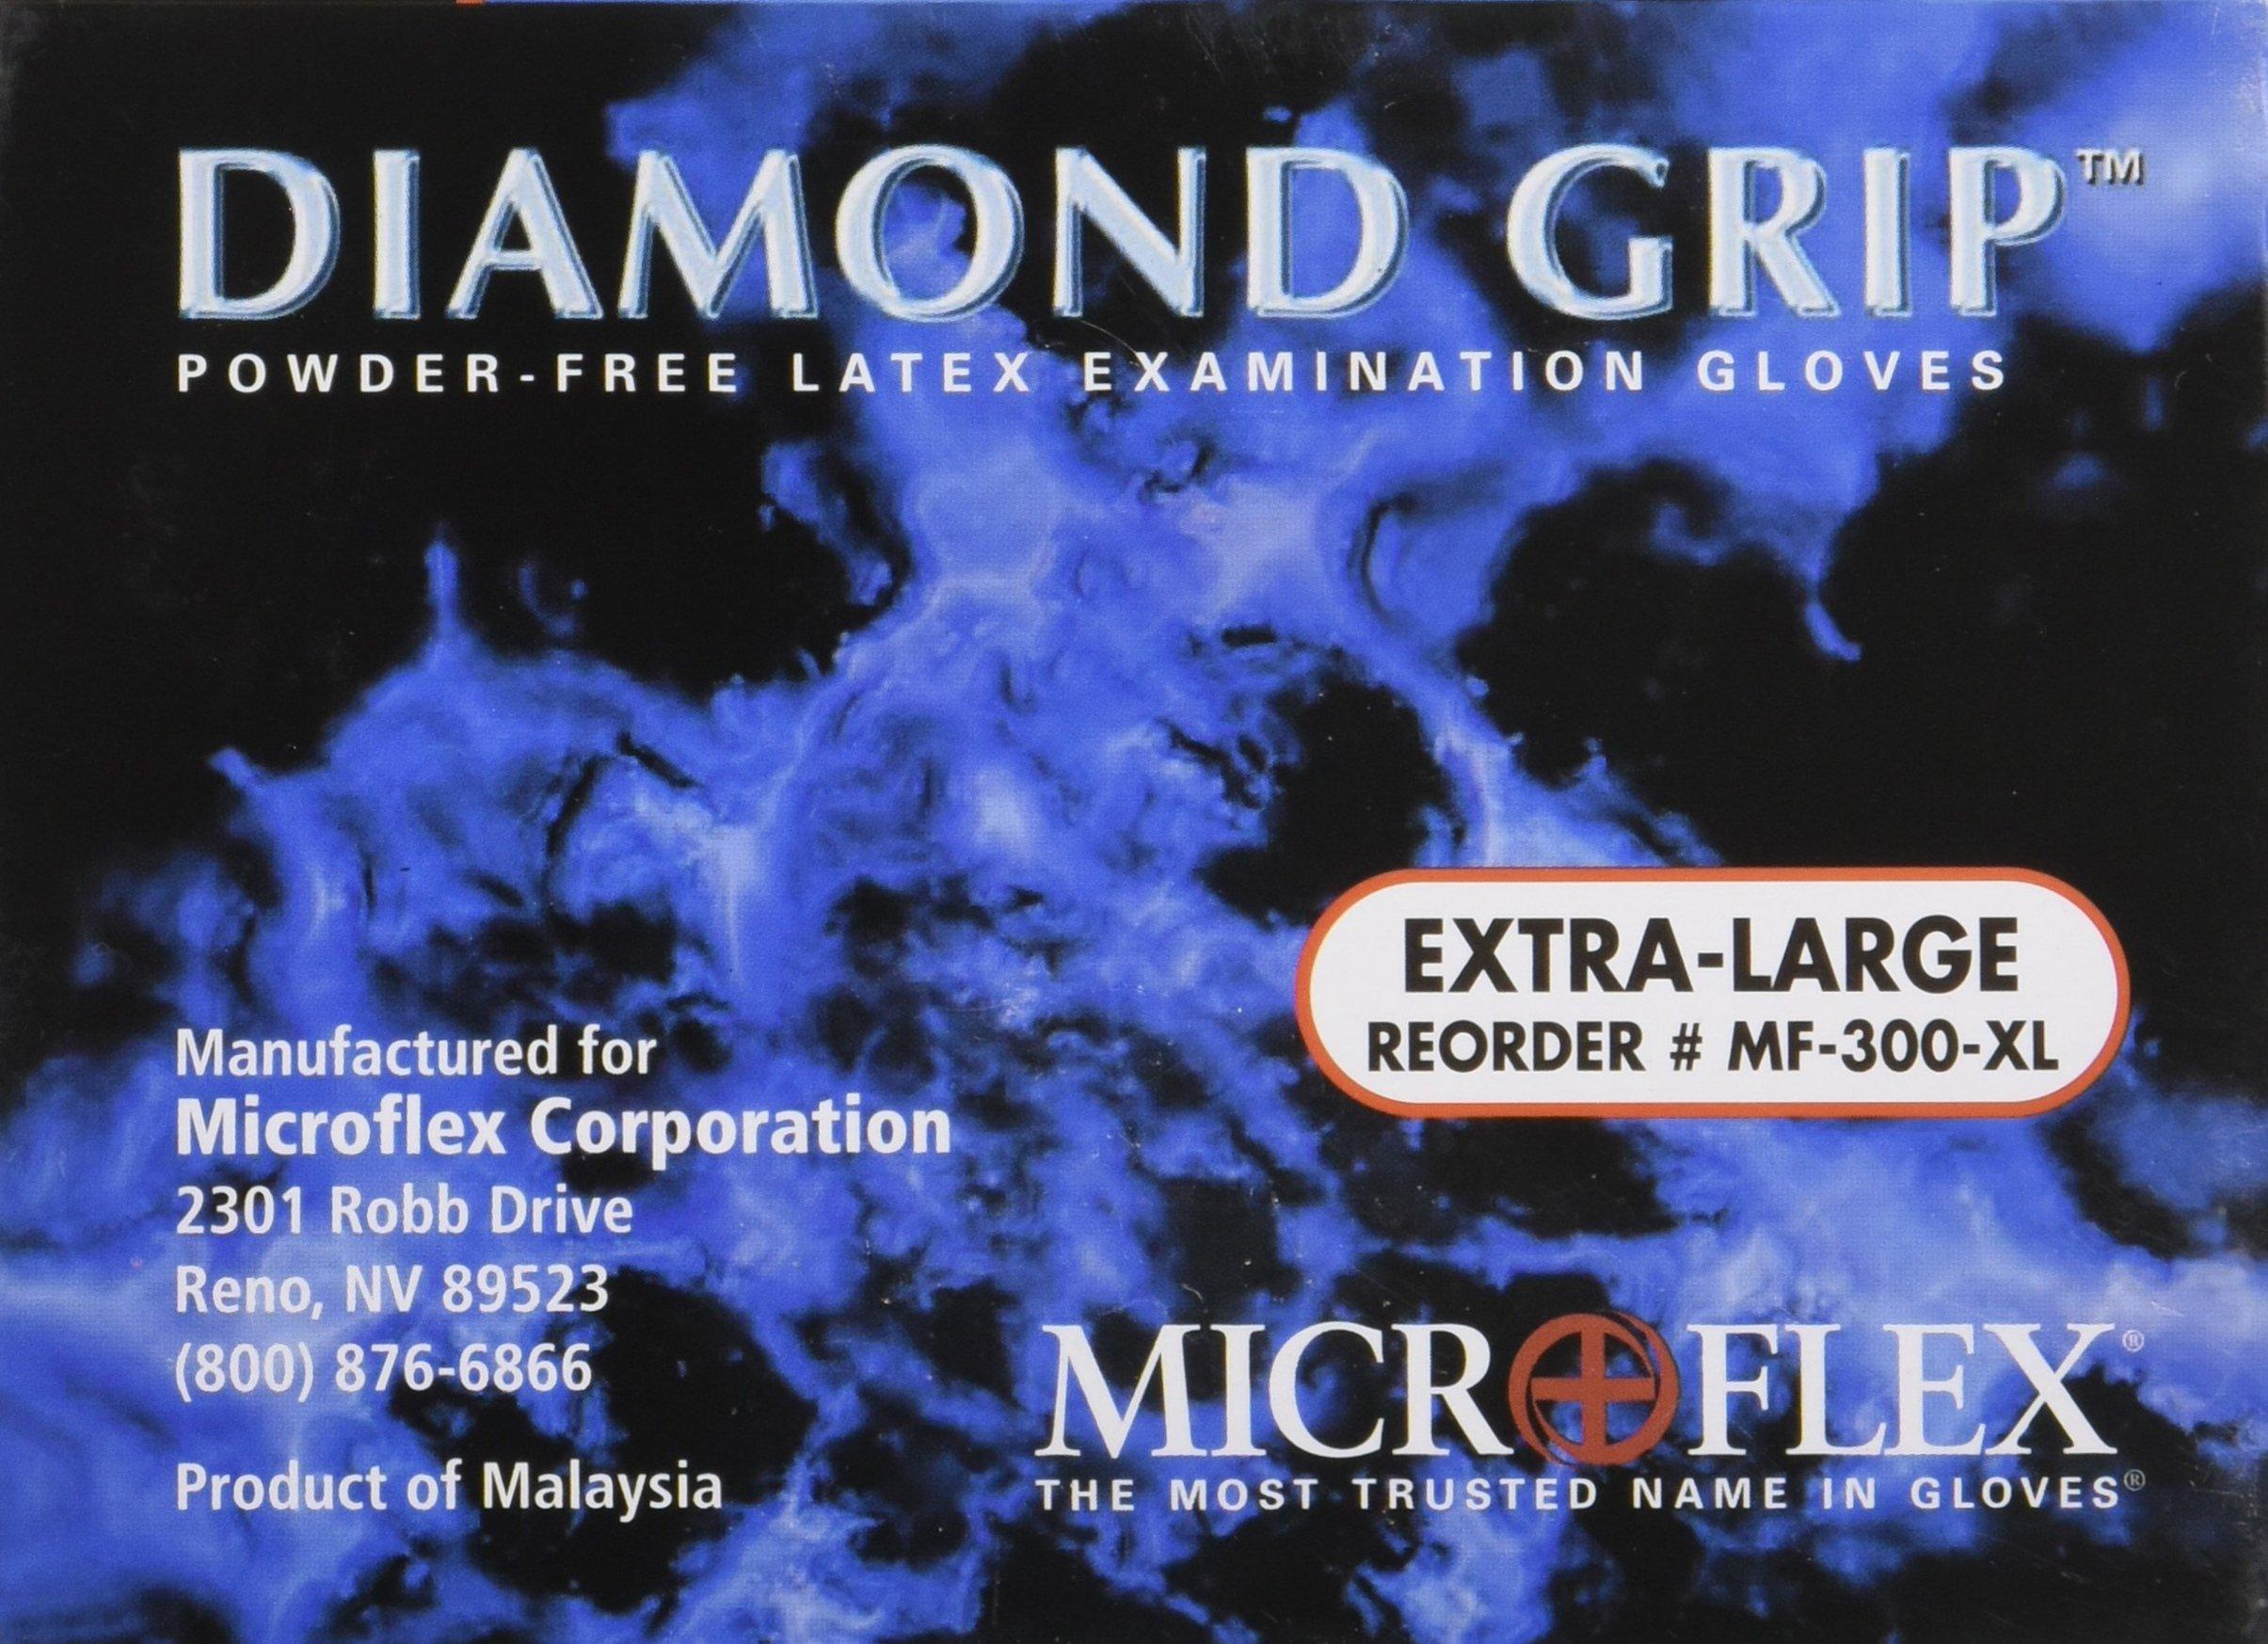 Microflex MF300XL-10PK - Diamond Grip Powder-Free Latex Gloves - Case Of 10 B... by Microflex (Image #4)